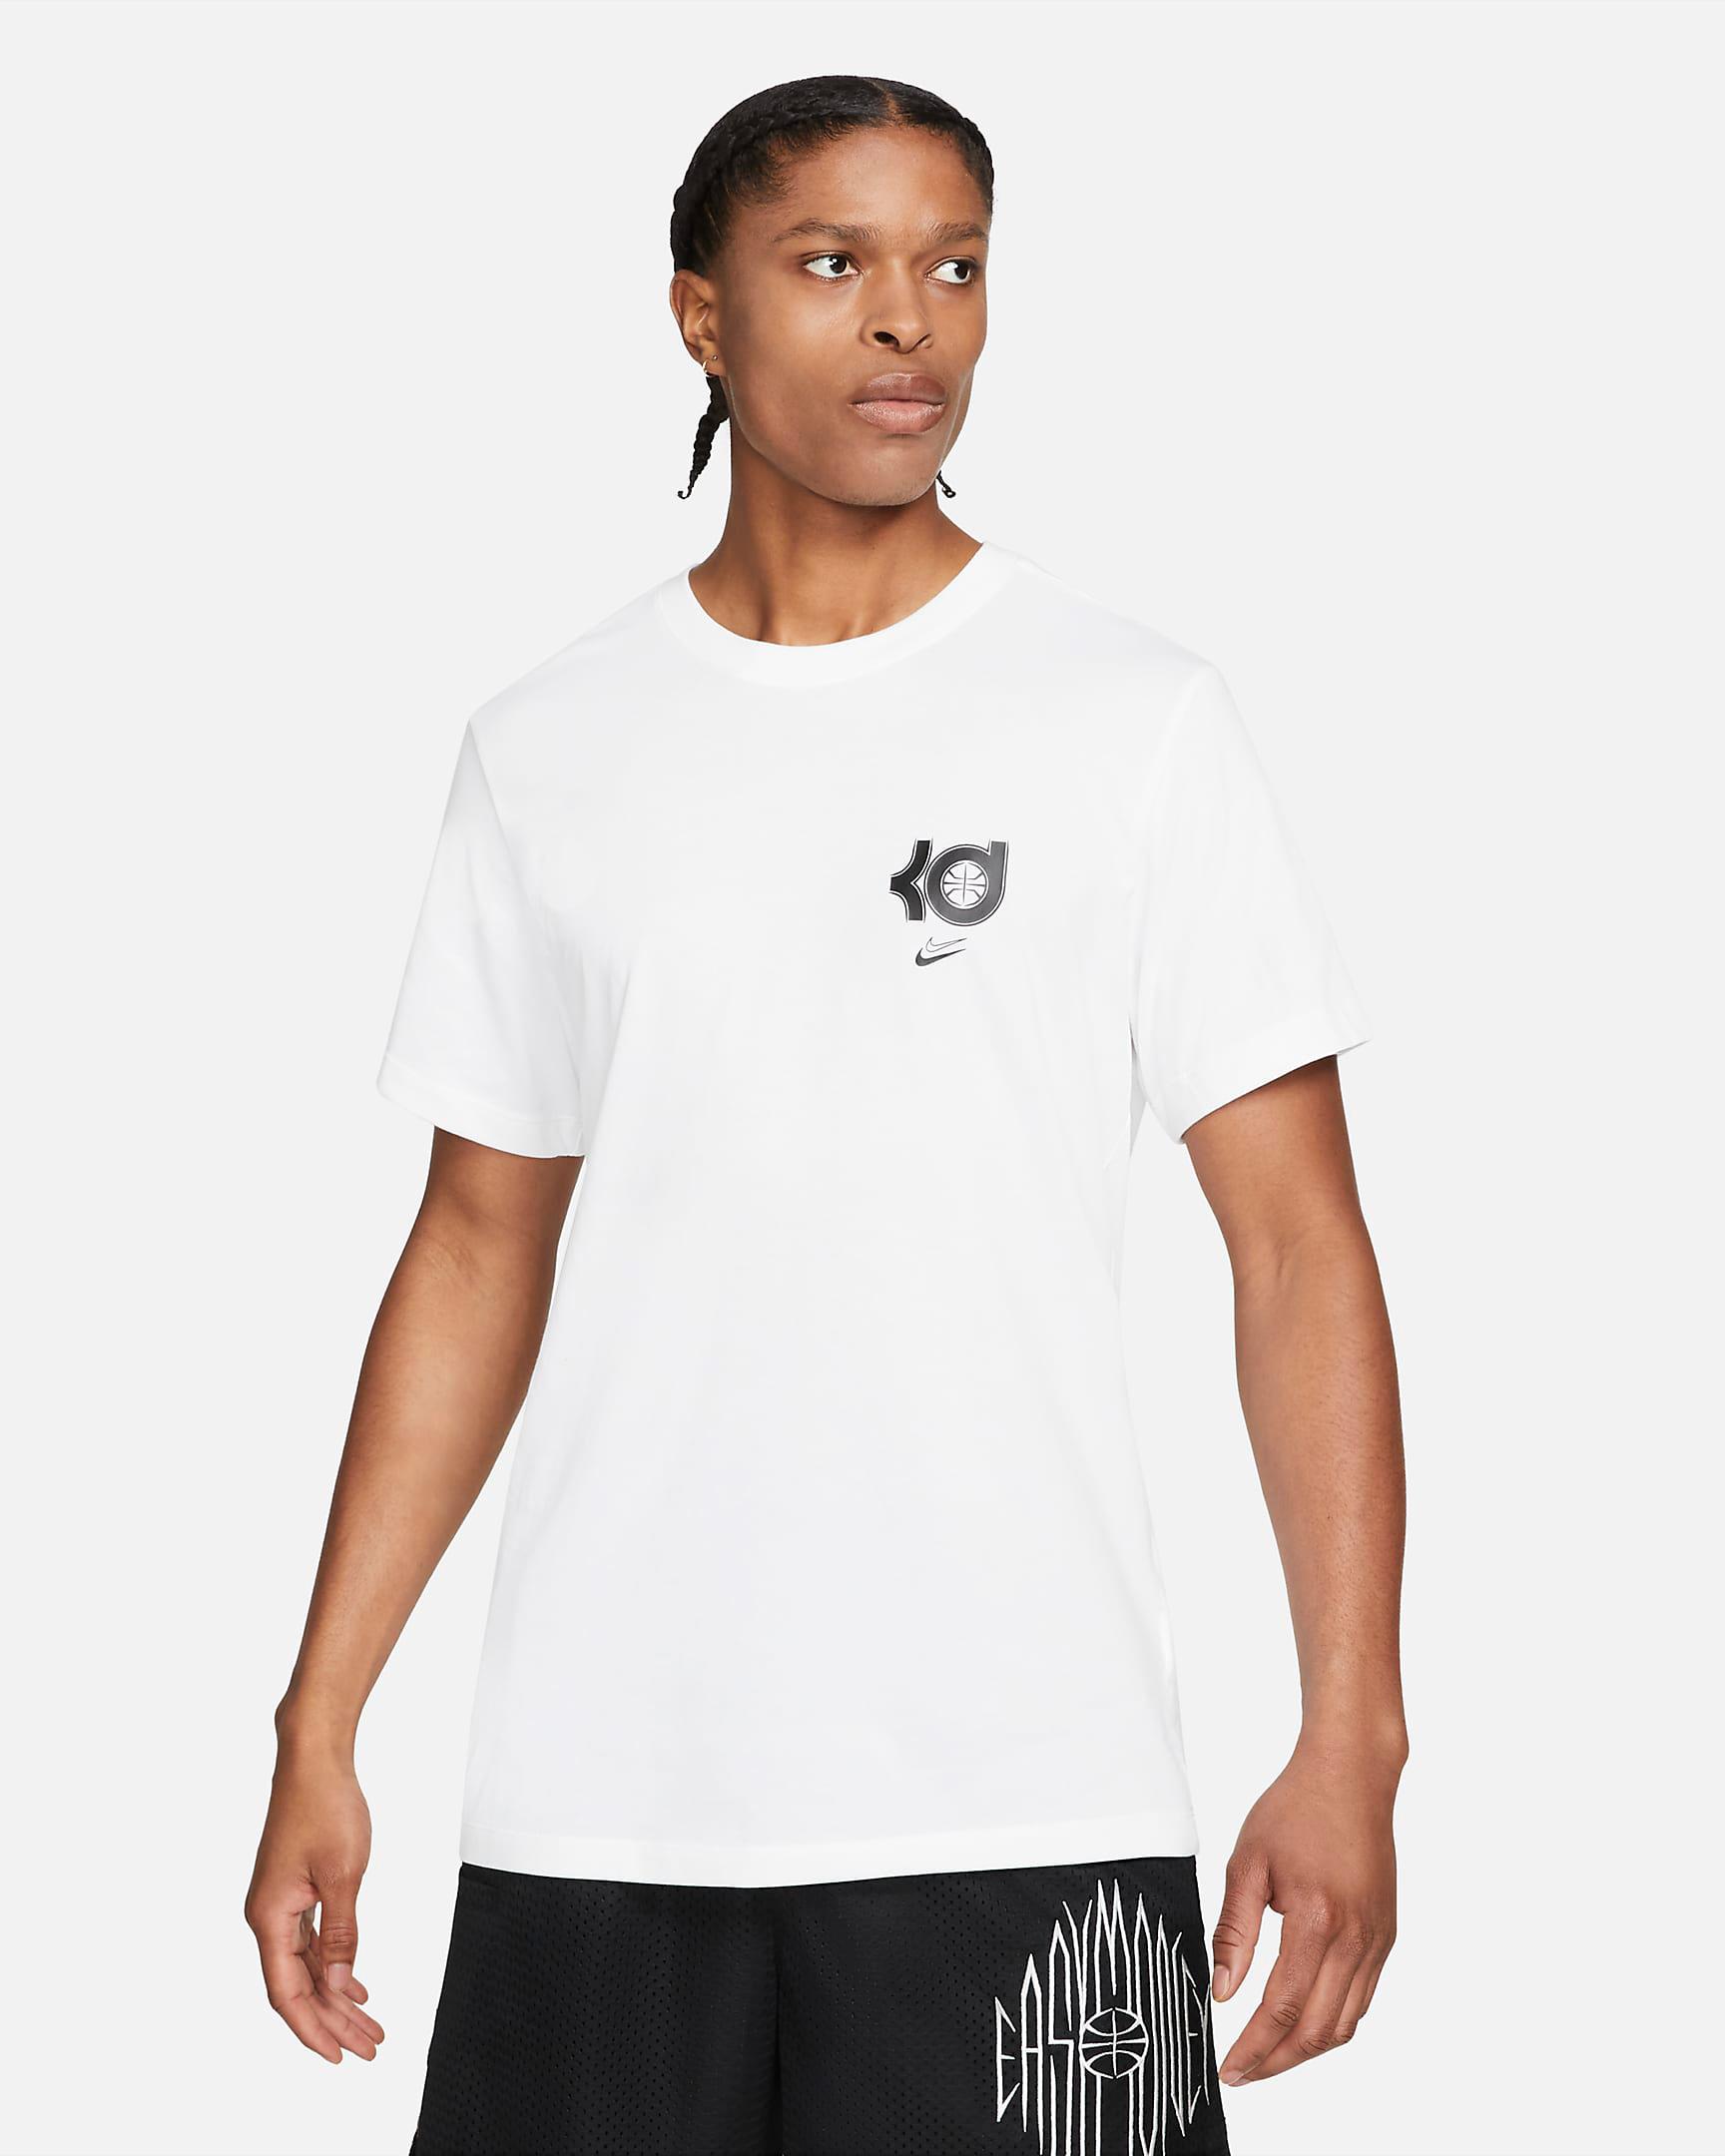 nike-kd-14-shirt-white-black-1